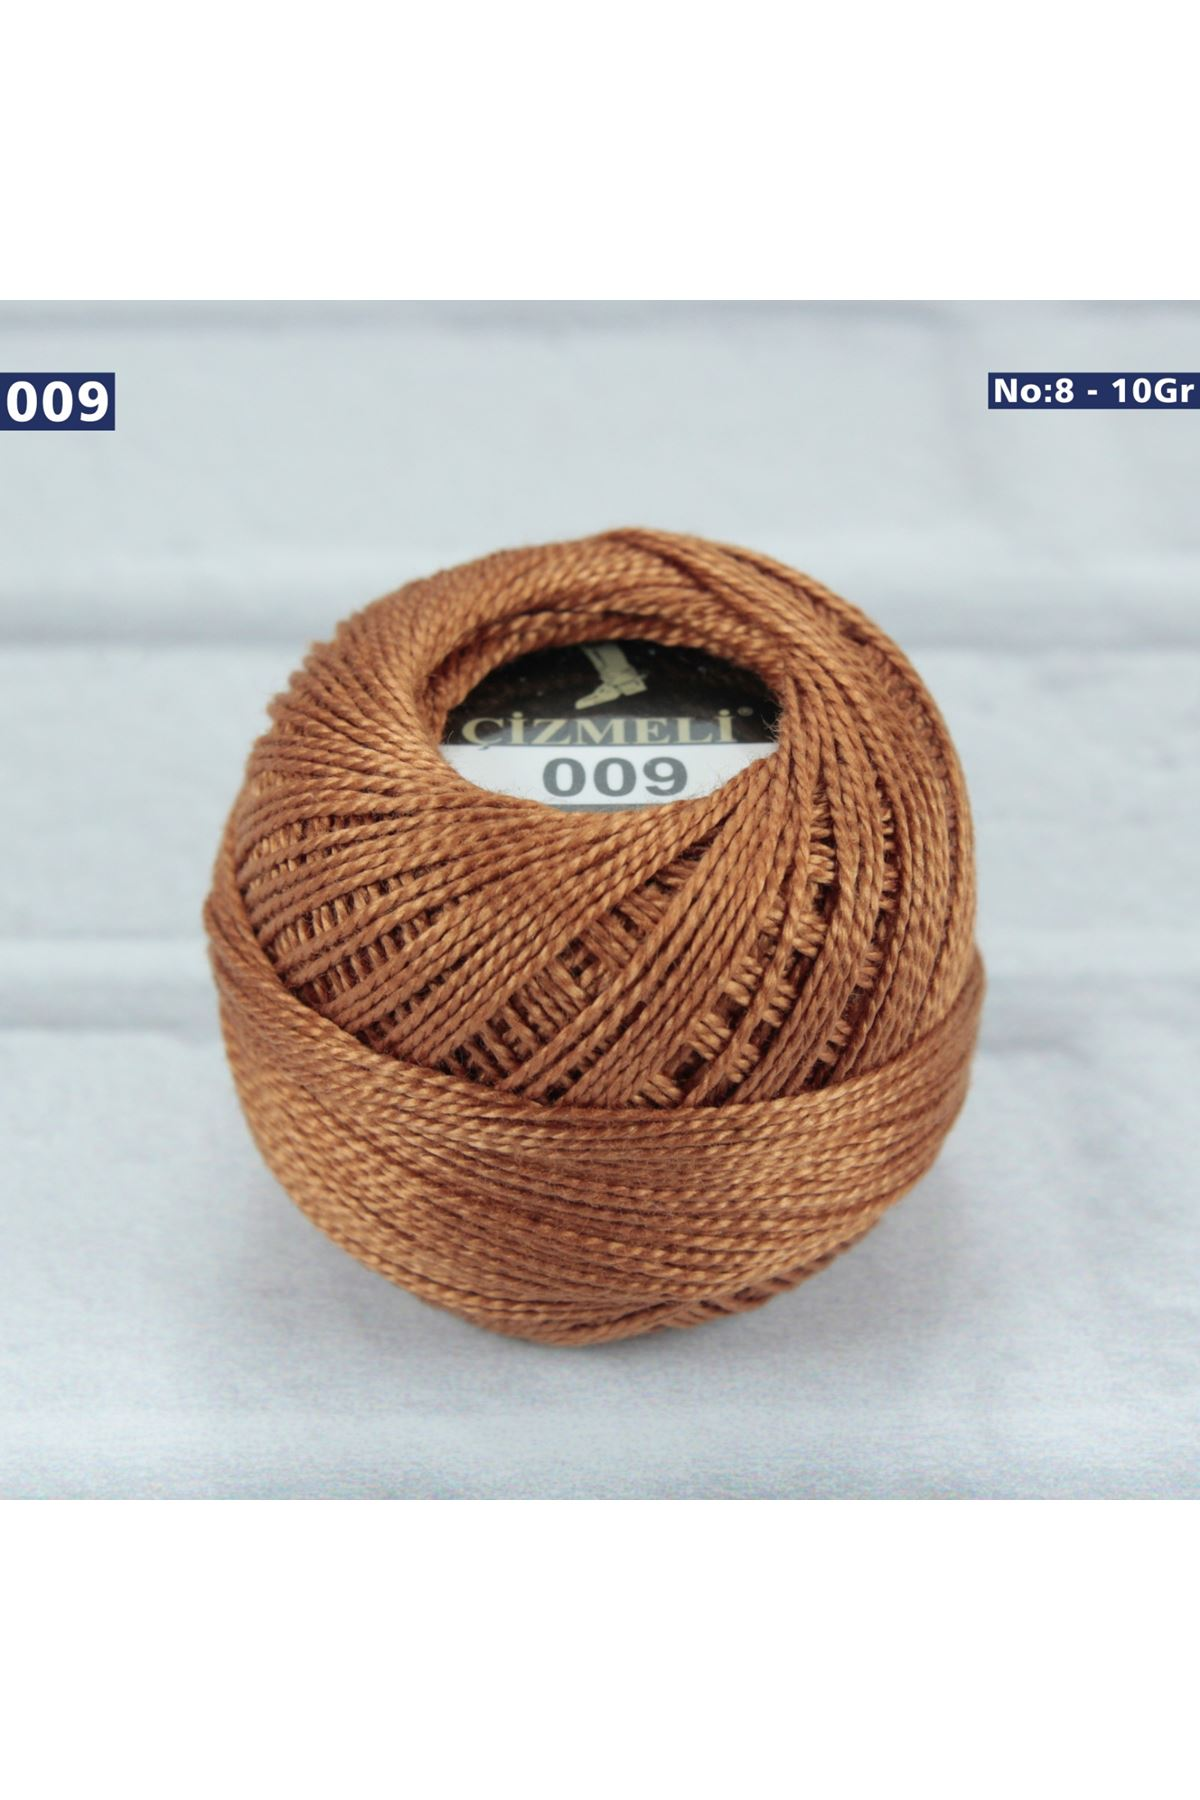 Çizmeli Cotton Perle Nakış İpliği No: 009